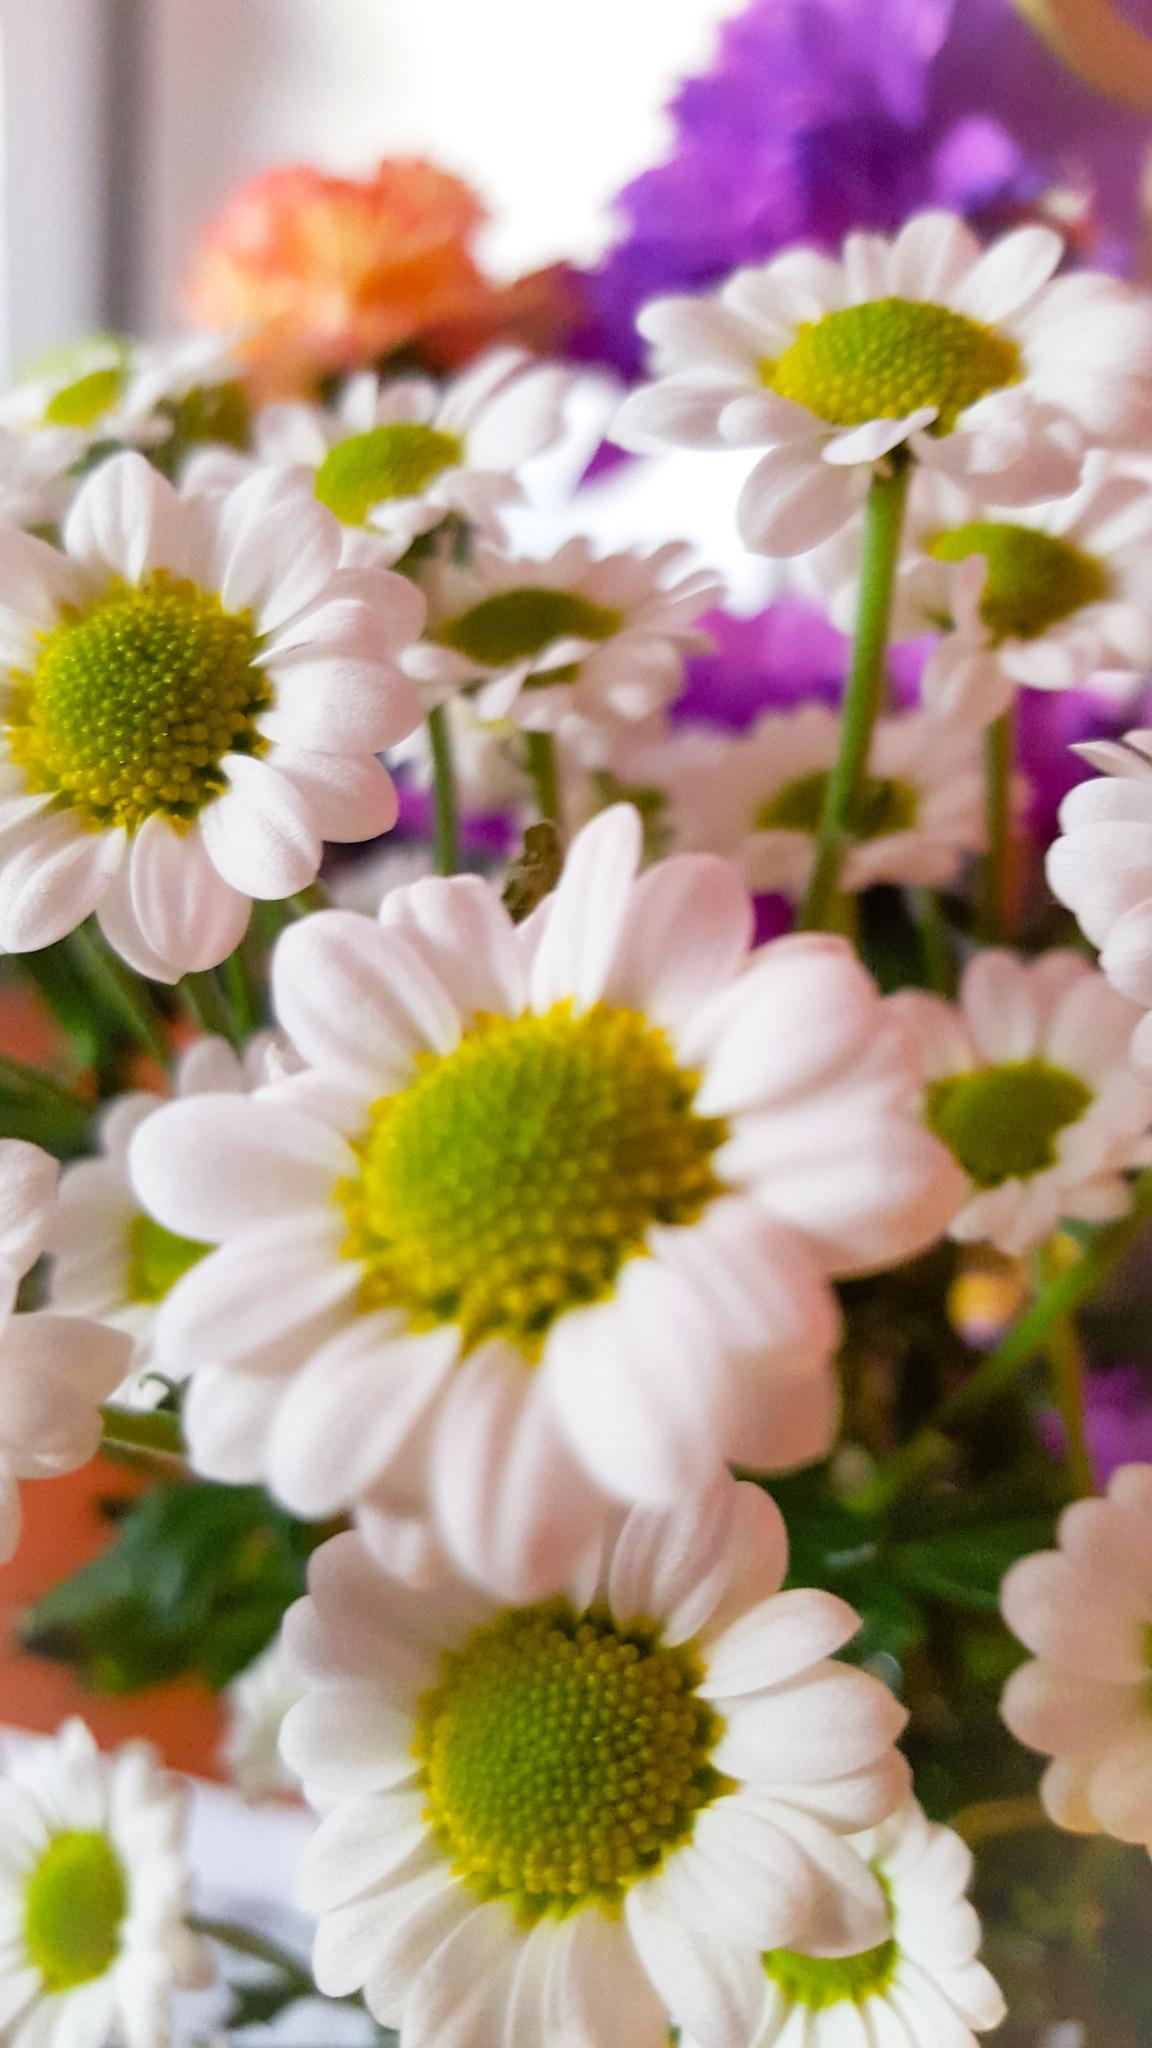 Floral by Heather Lovatt